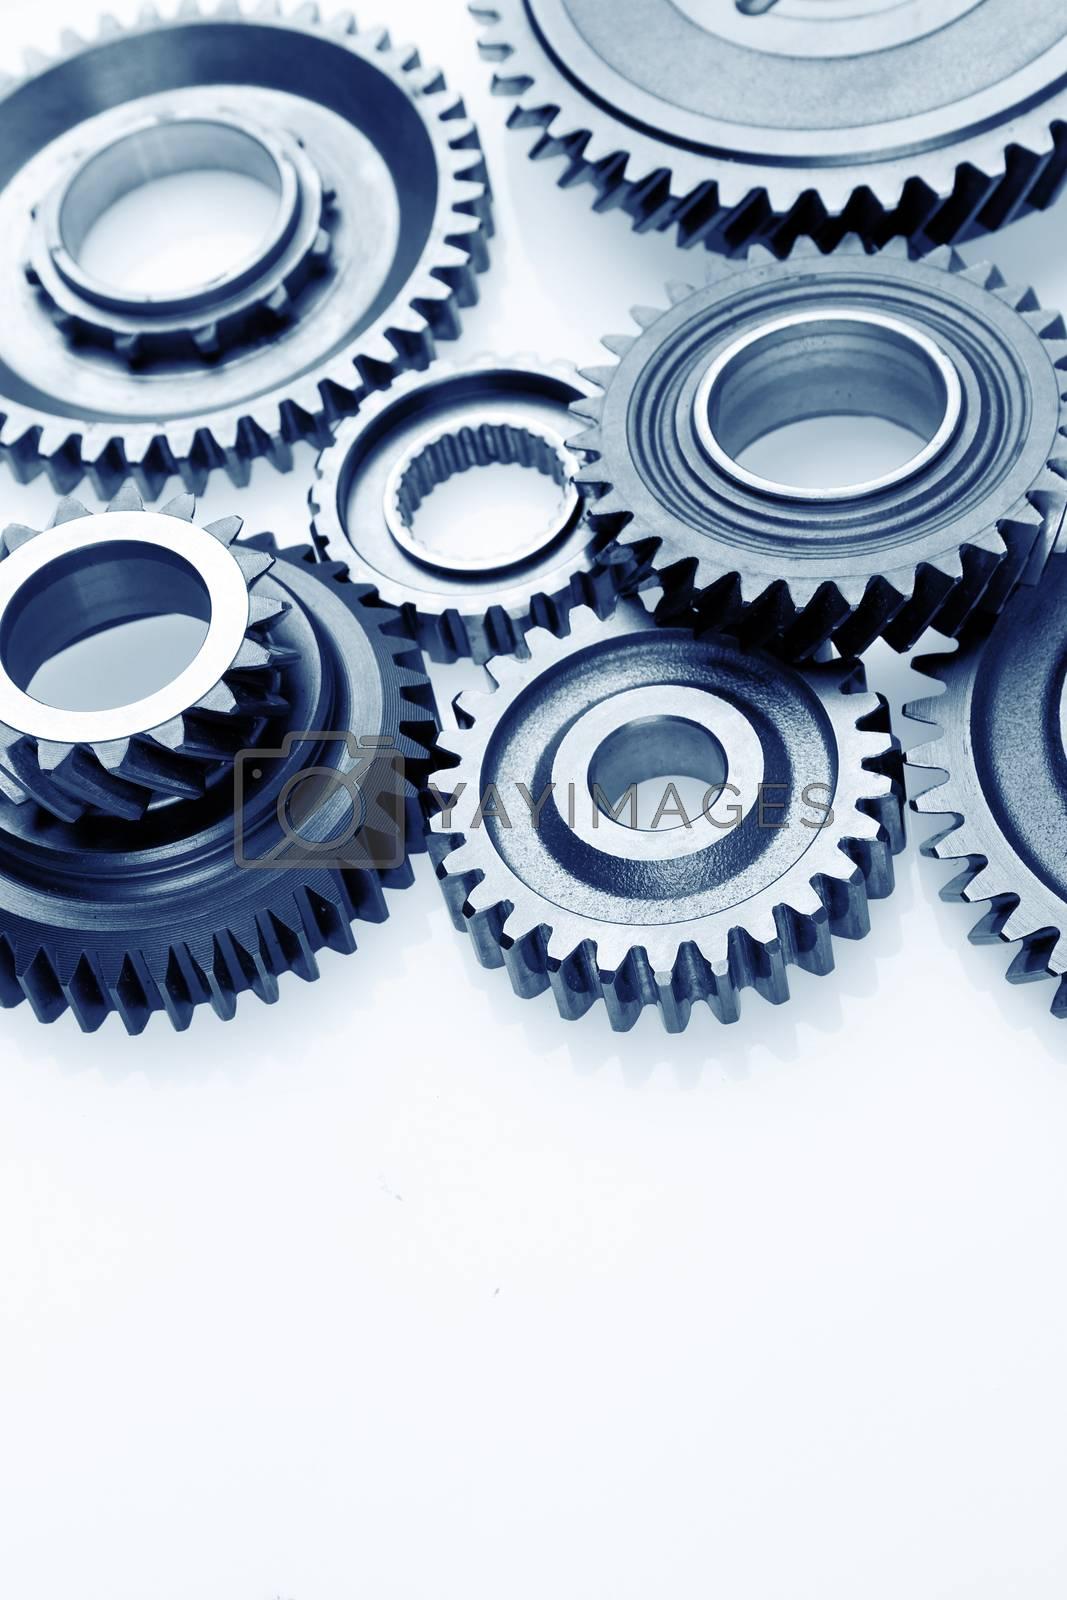 Closeup of metal cog gears